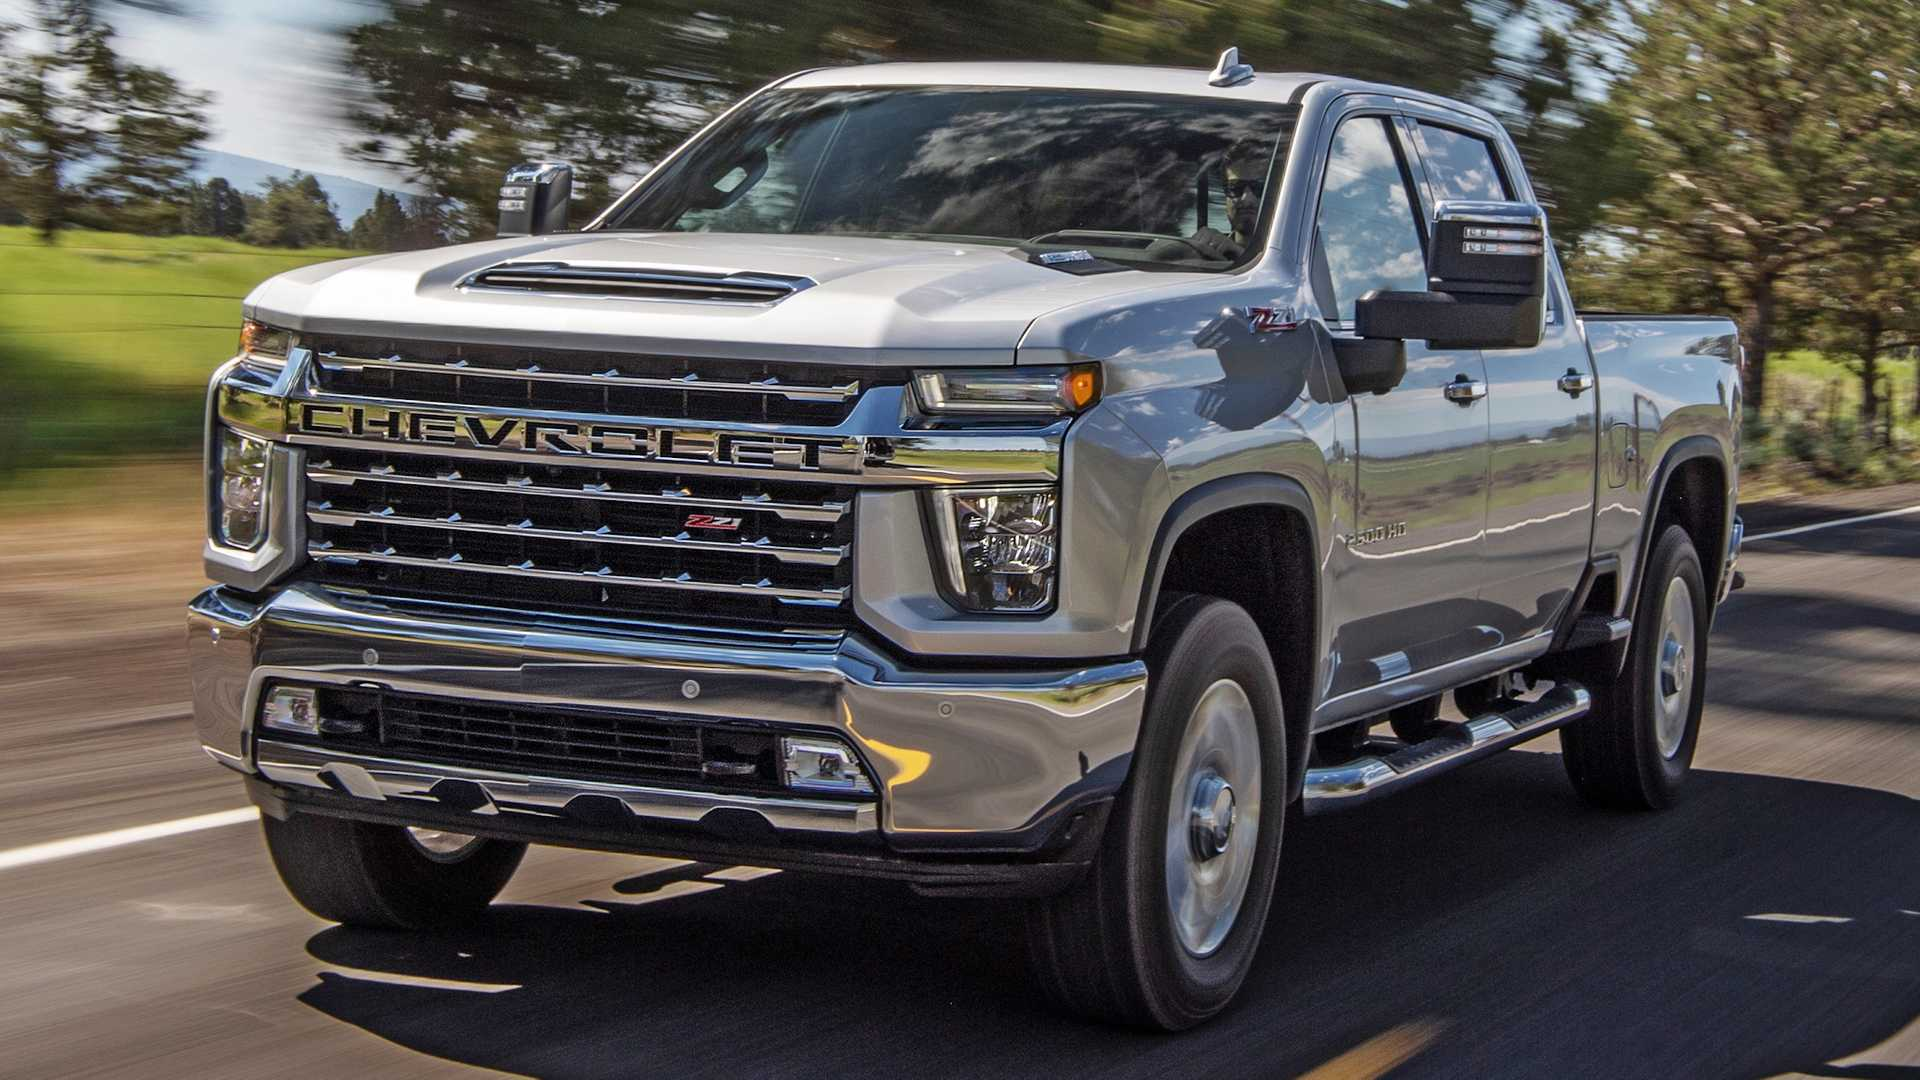 GM Orders Dealers To Stop Selling Certain Heavy Duty Trucks